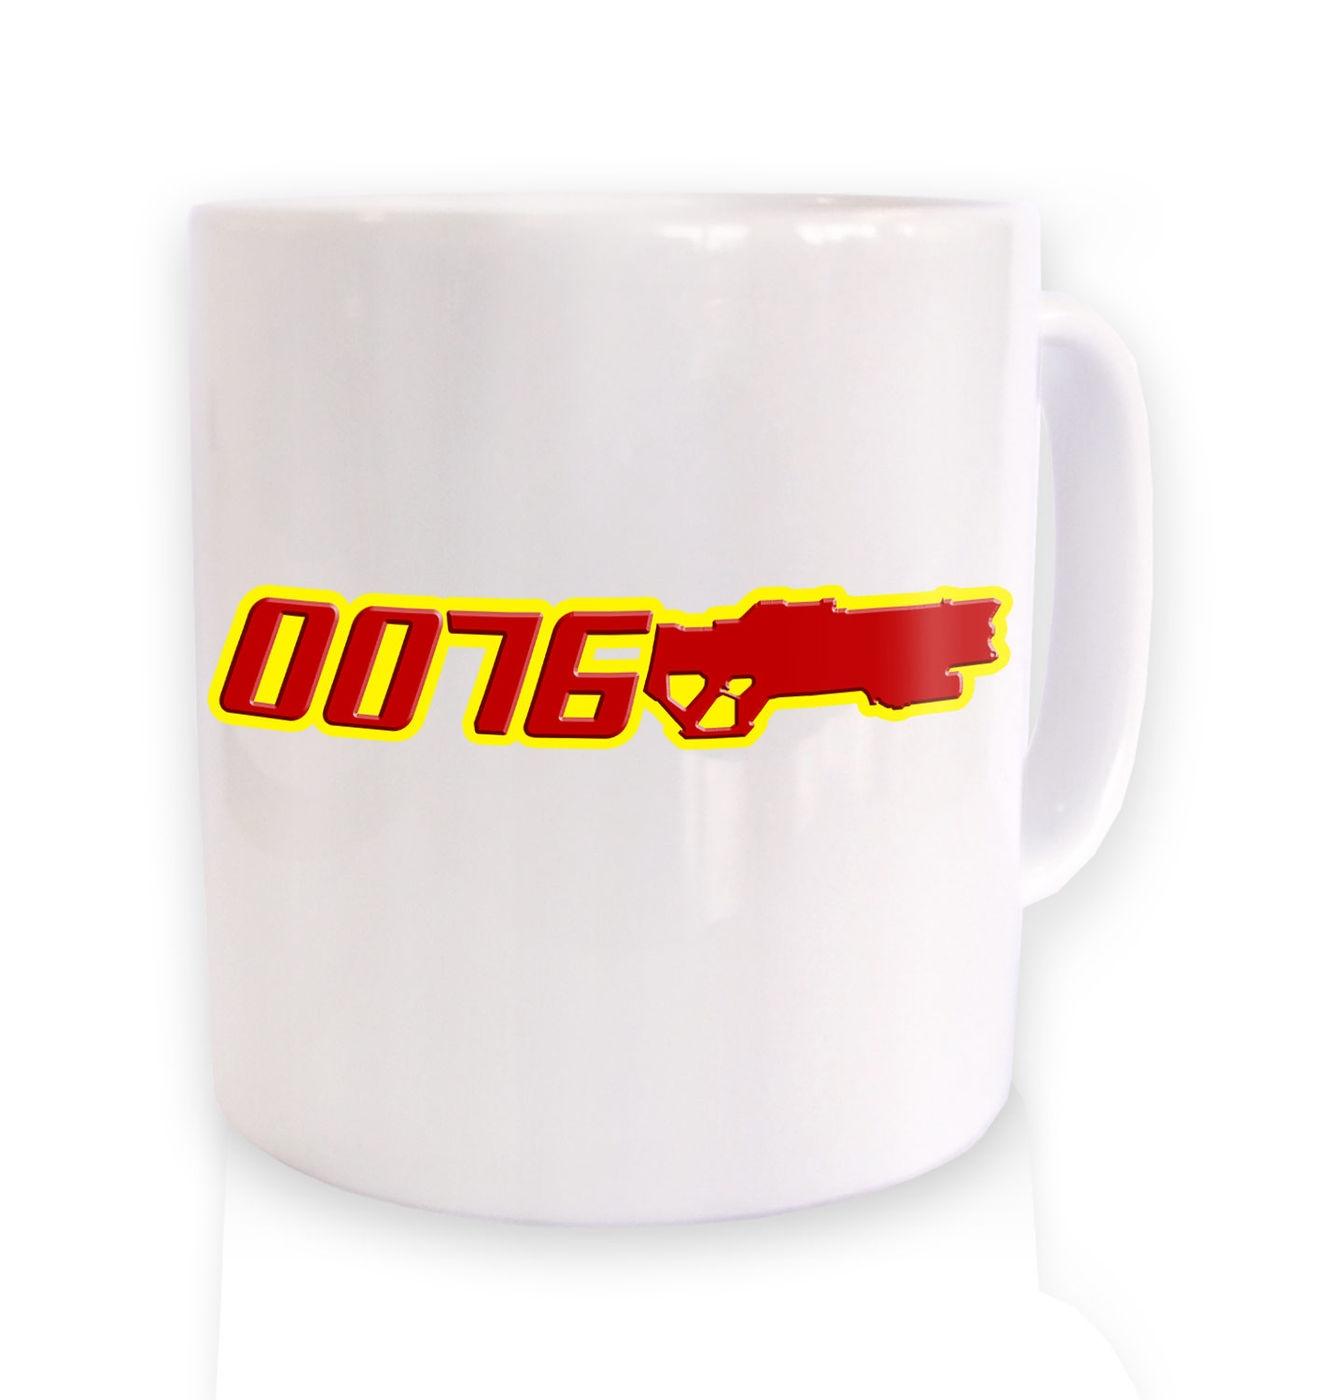 Agent 0076 mug by Something Geeky